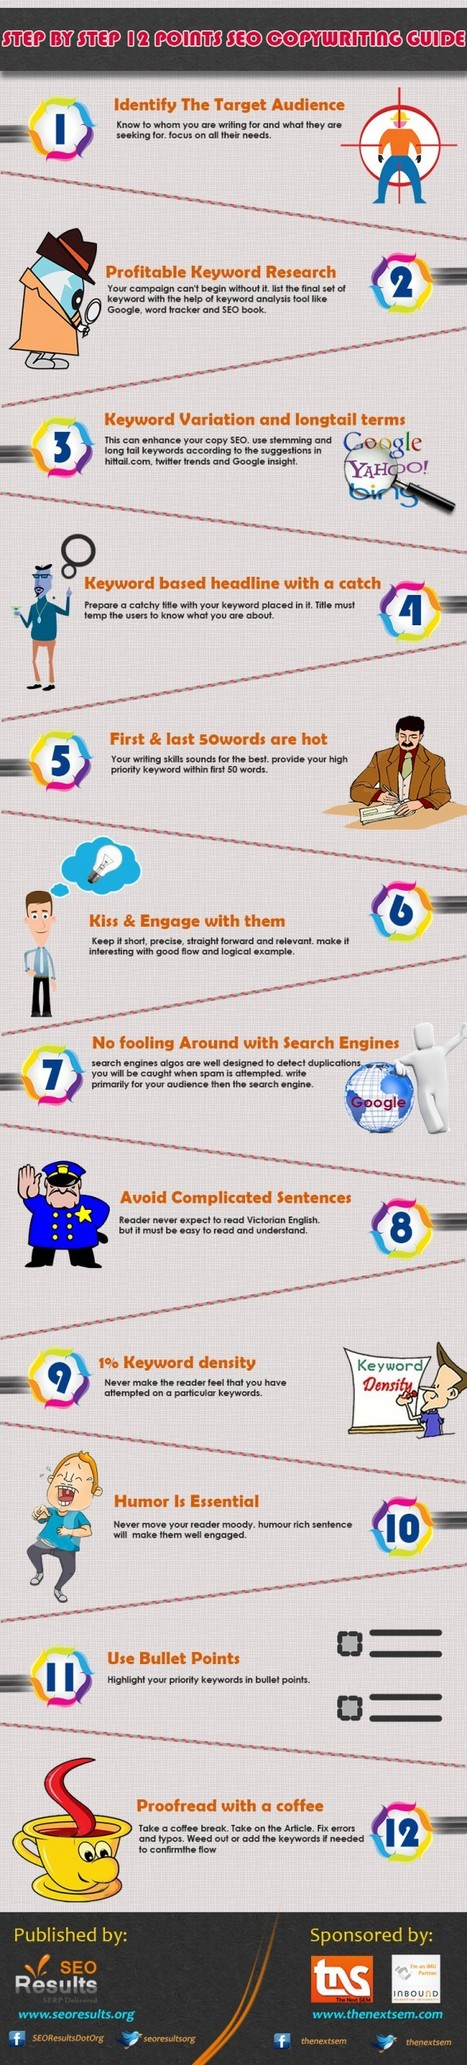 Infographic: 12 ways to improve SEO copywriting | ten Hagen on Social Media | Scoop.it